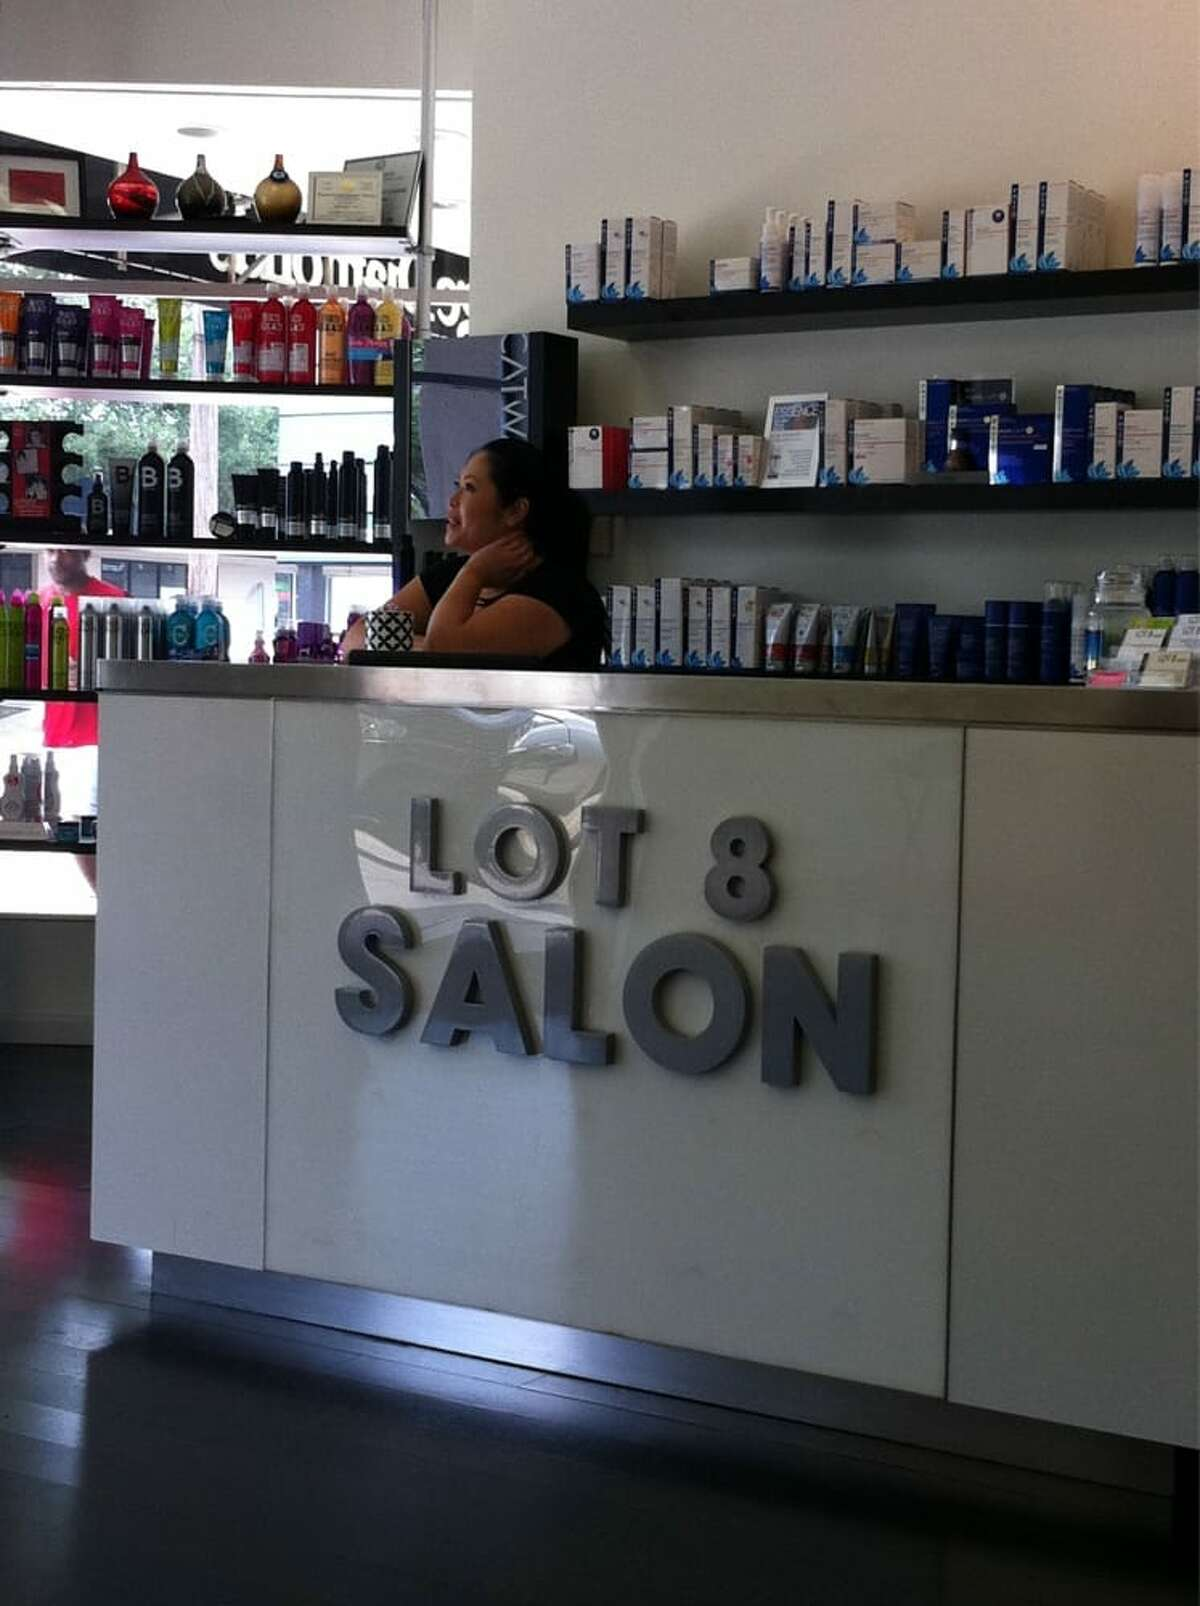 14. Lot 8 Salon Address: 2372 Rice Boulevard Stars: 4.5